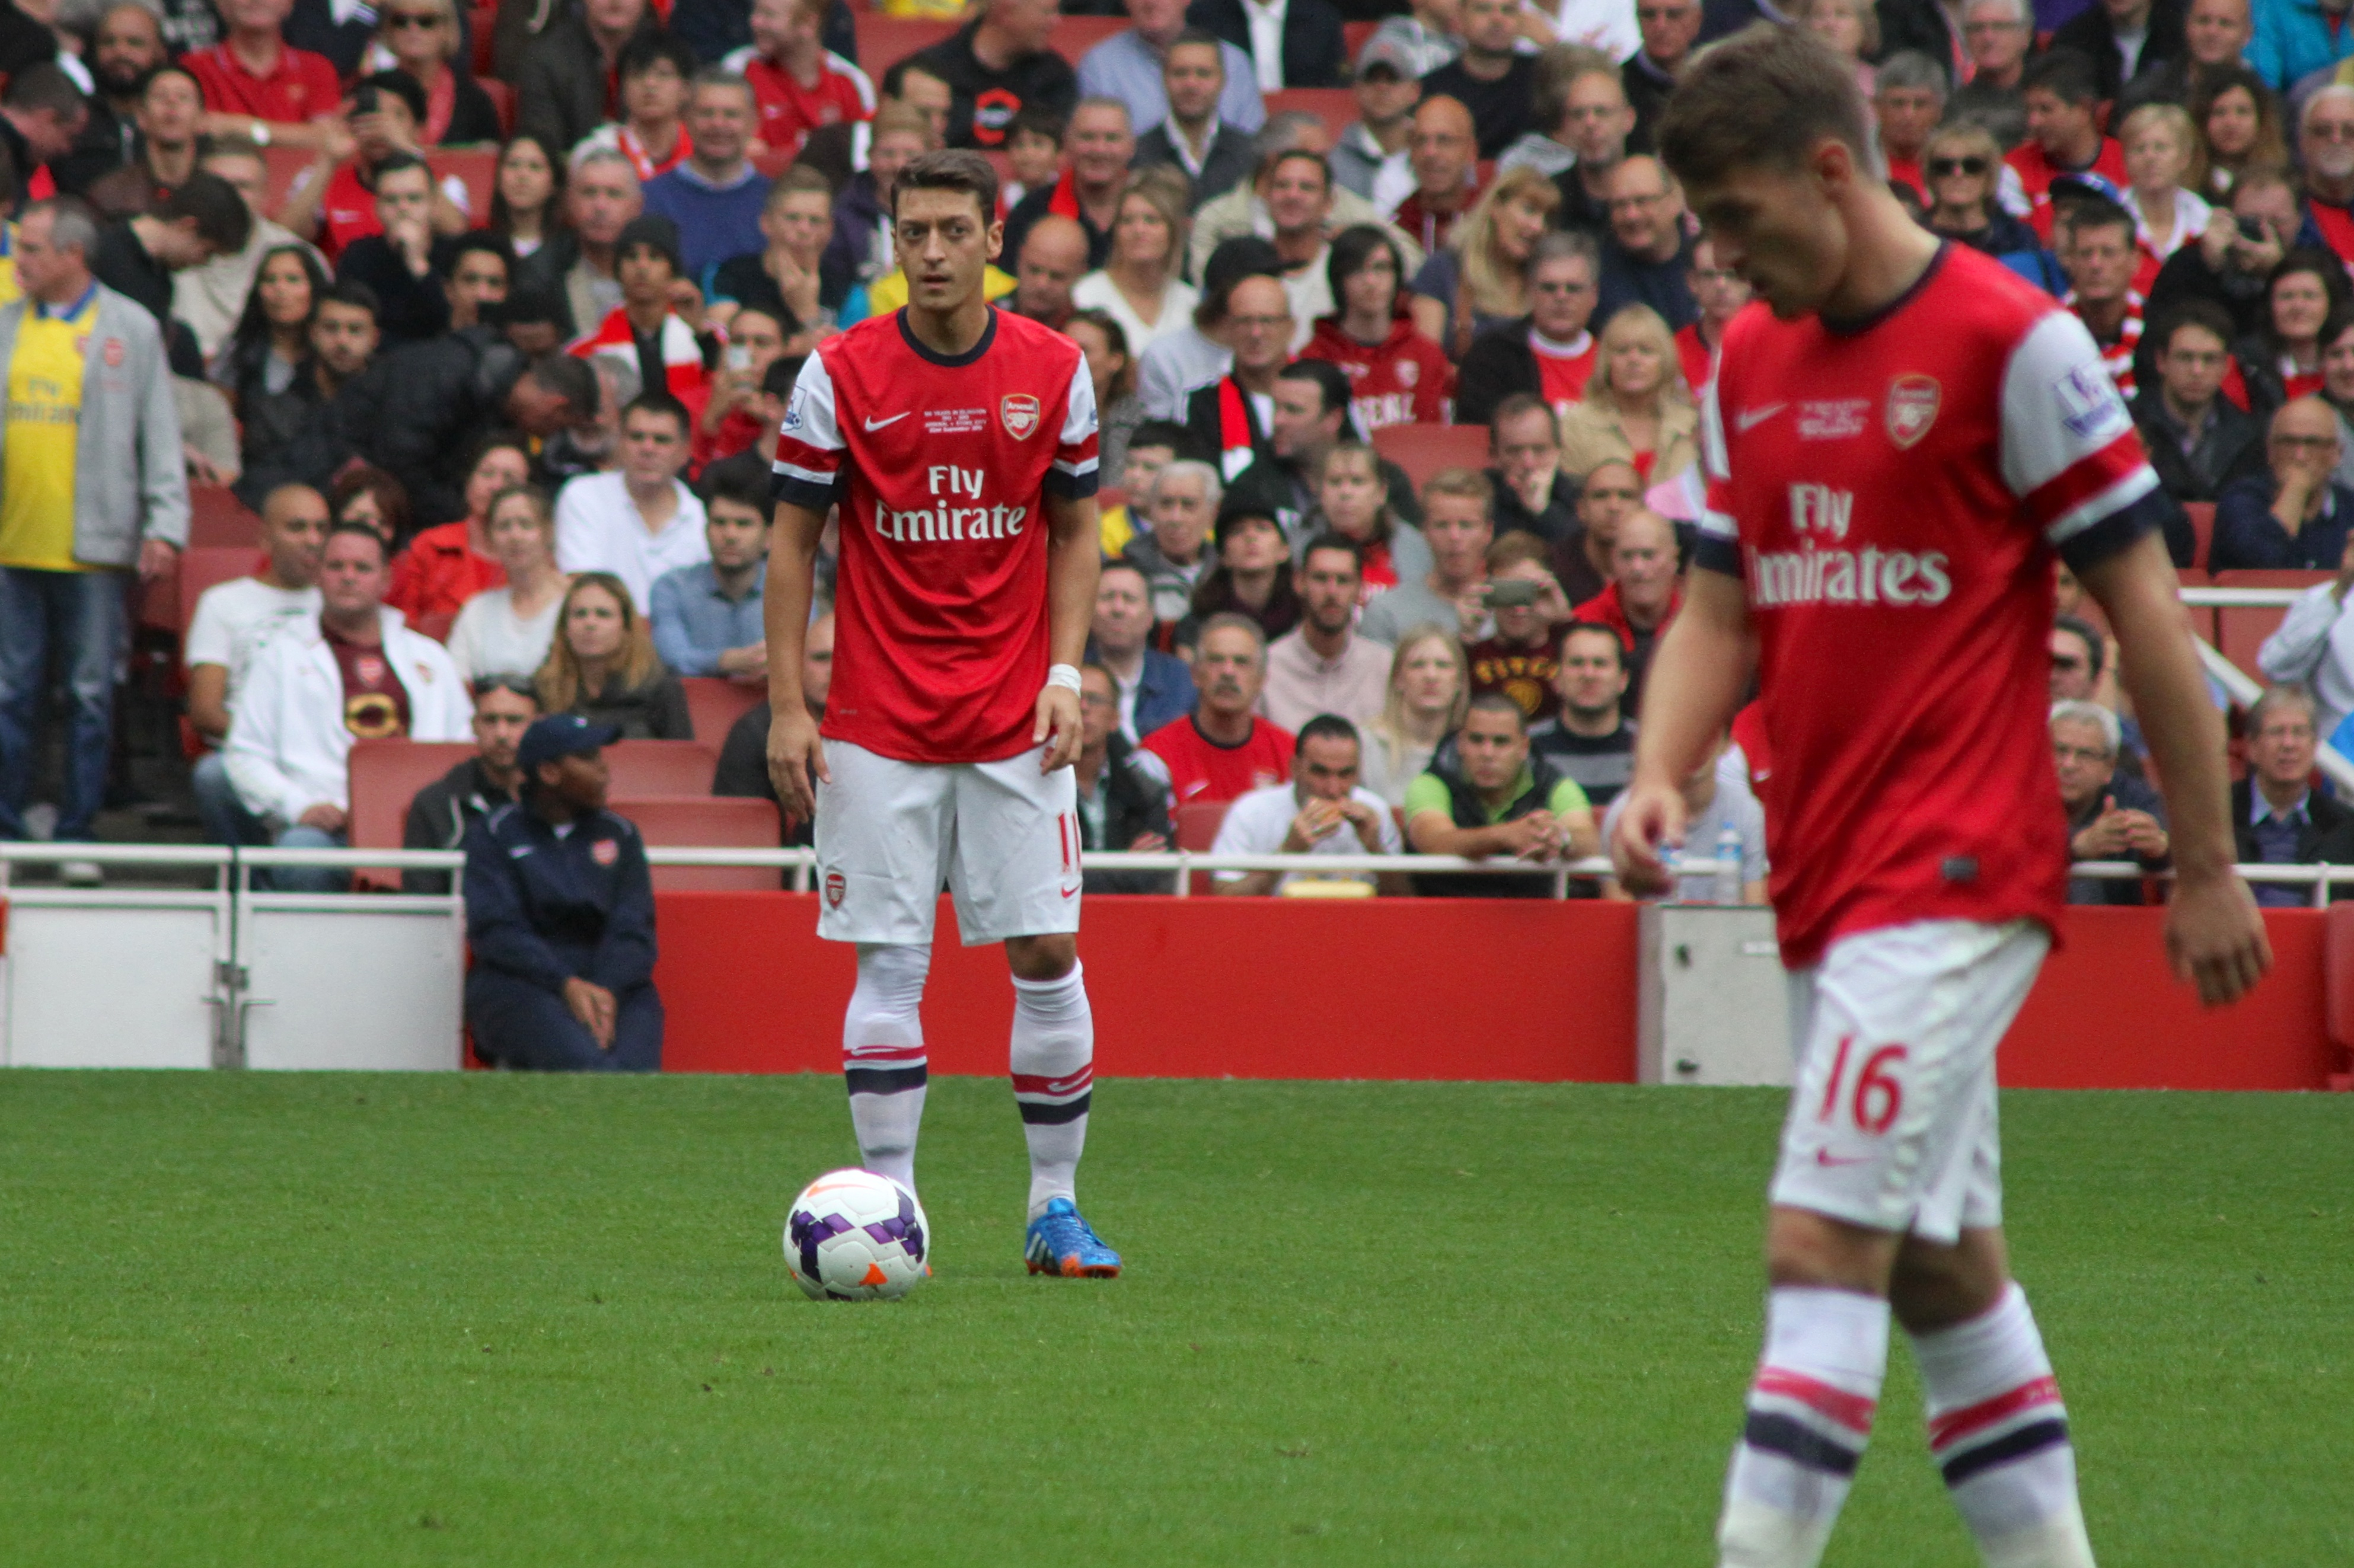 Arsenal Wikipedia: Can Arsenal Win The Double This Season?